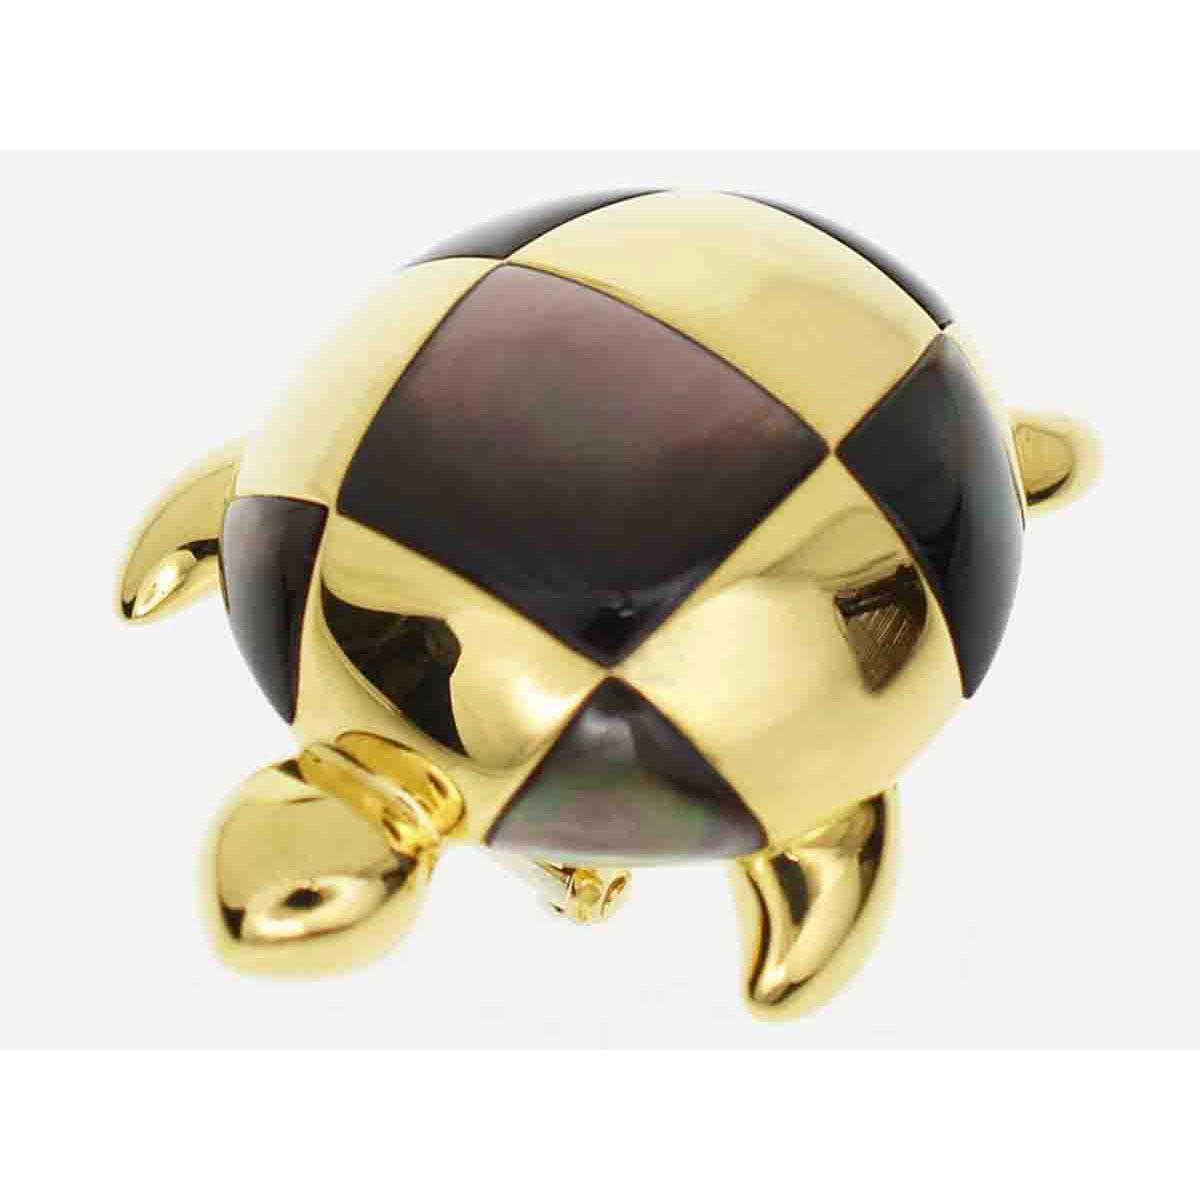 MAUBOUSSIN モーブッサン turtle タートル ブローチ 750 K18 YG イエローゴールド ブラックシェル【送料無料】【代引き手数料無料】カメ 亀 レディース【中古】27861203